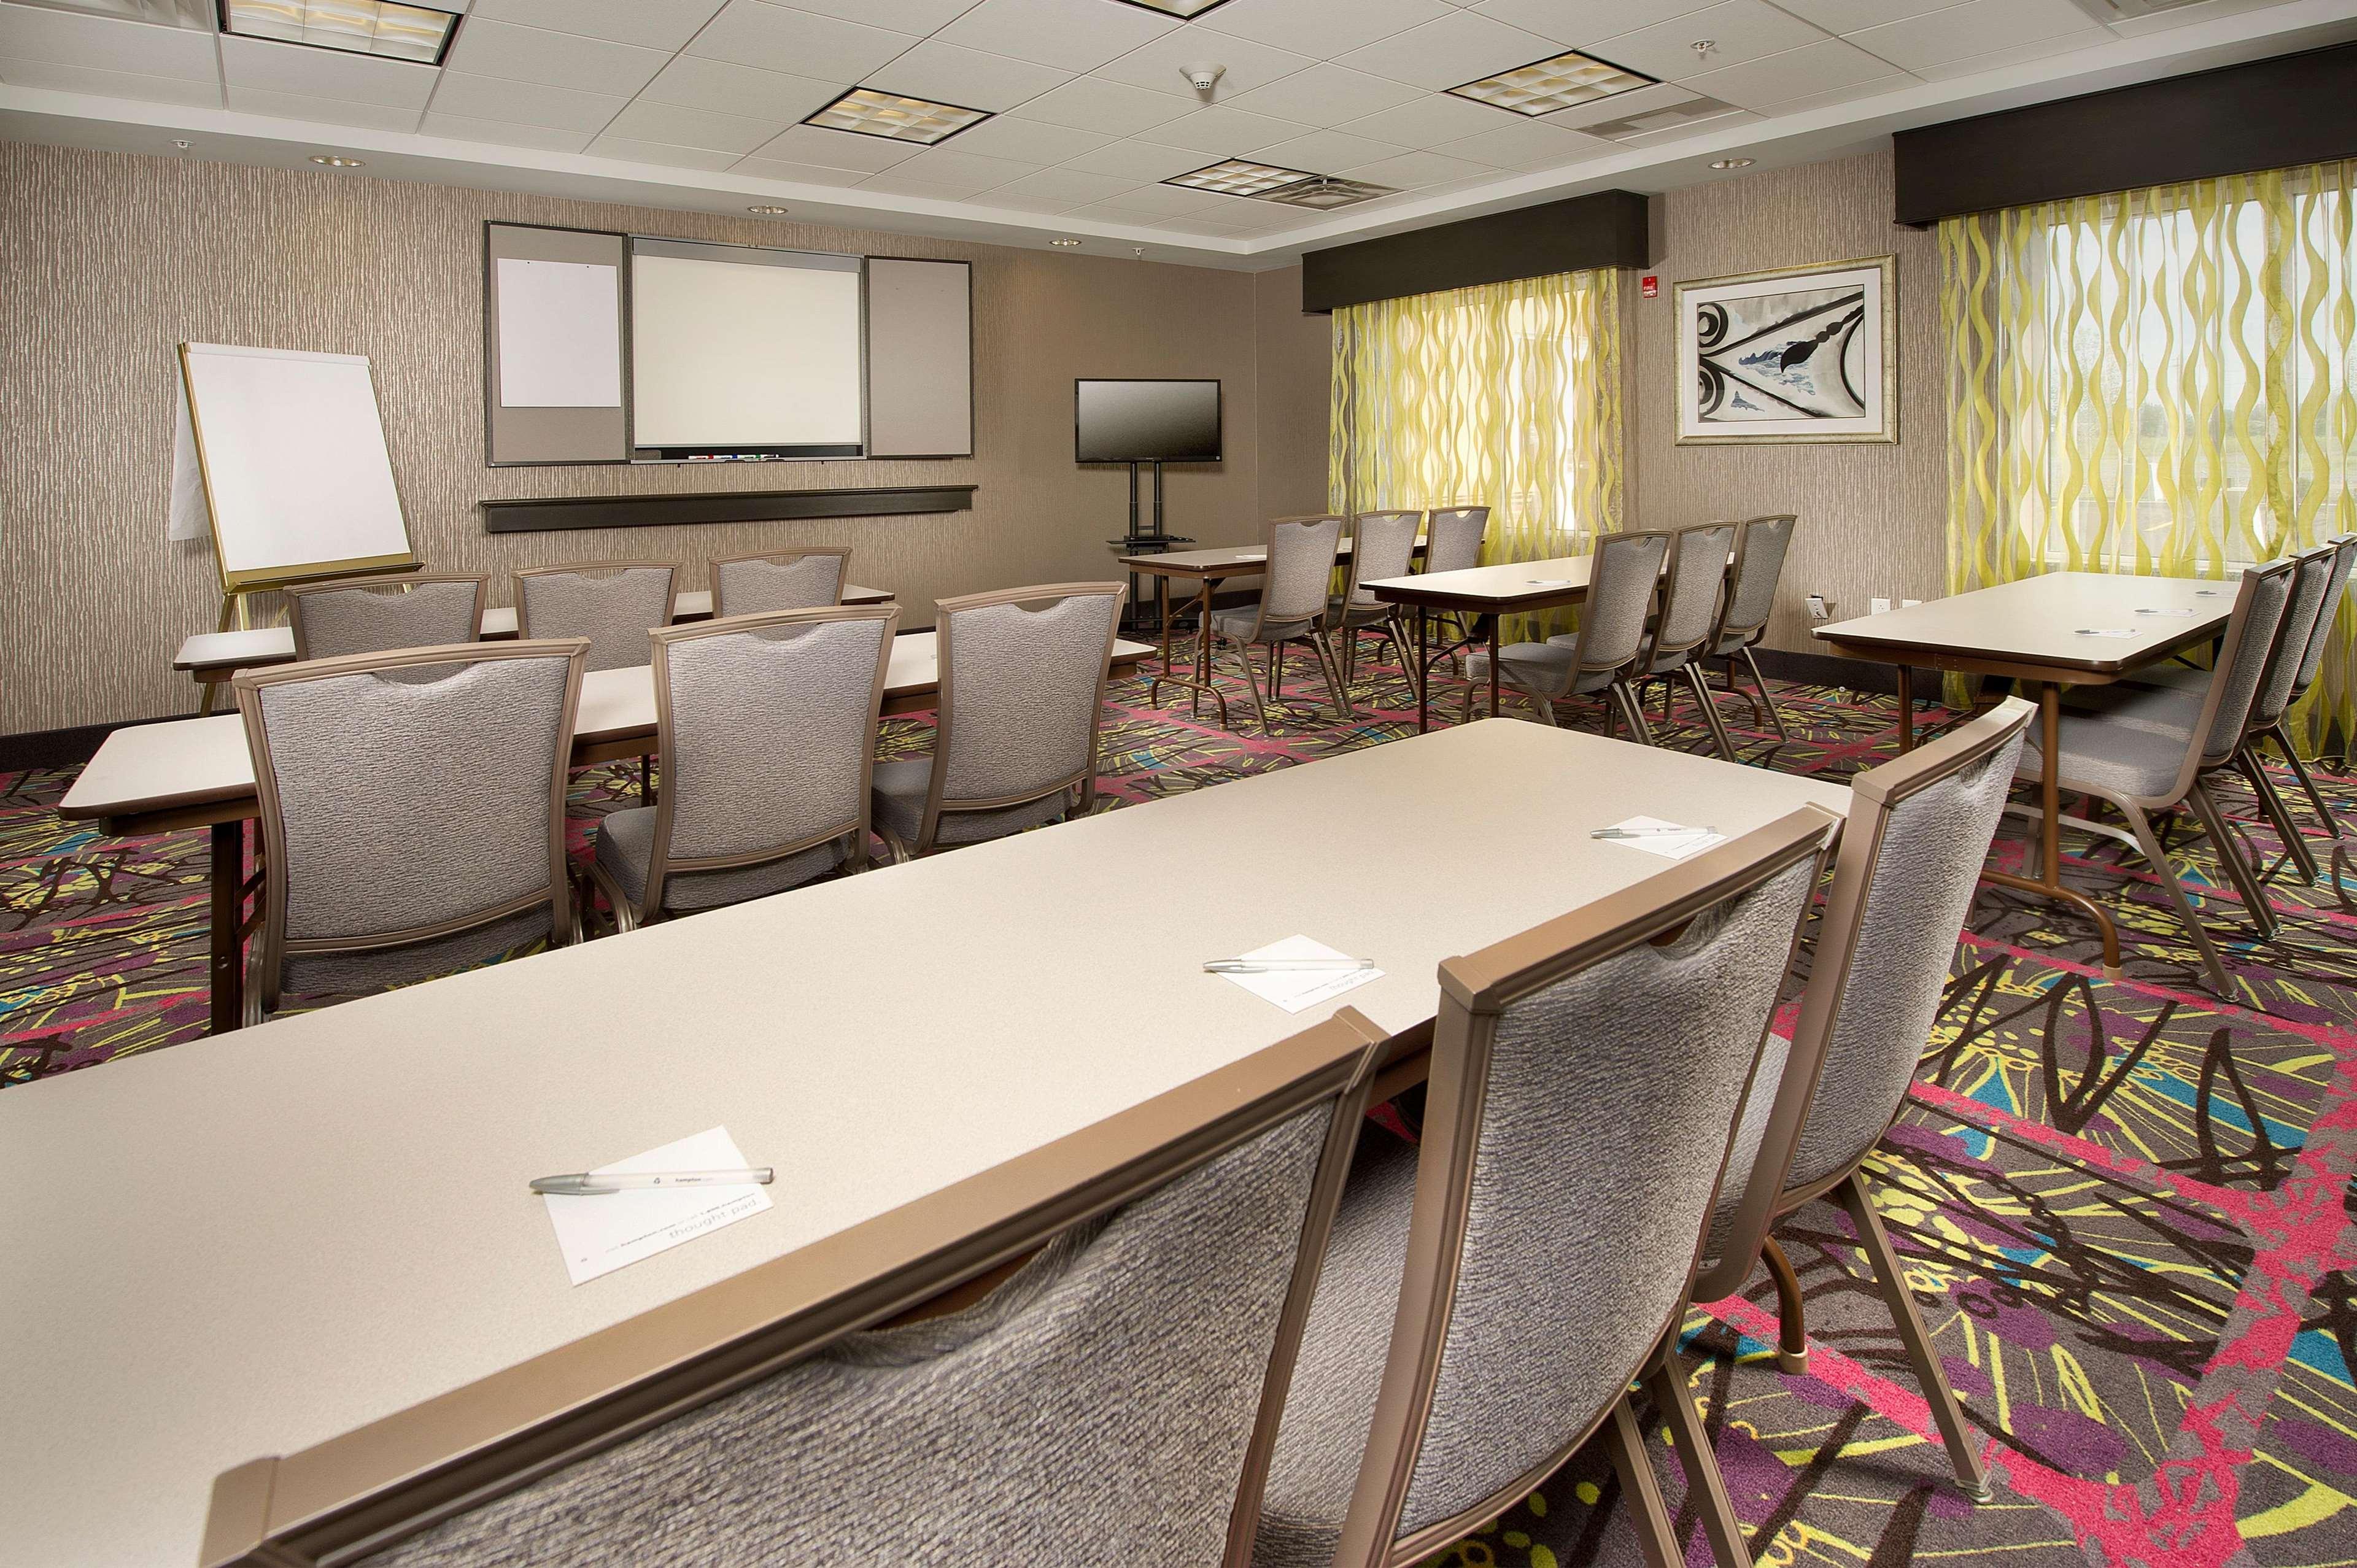 Hampton Inn & Suites Buffalo Airport image 13